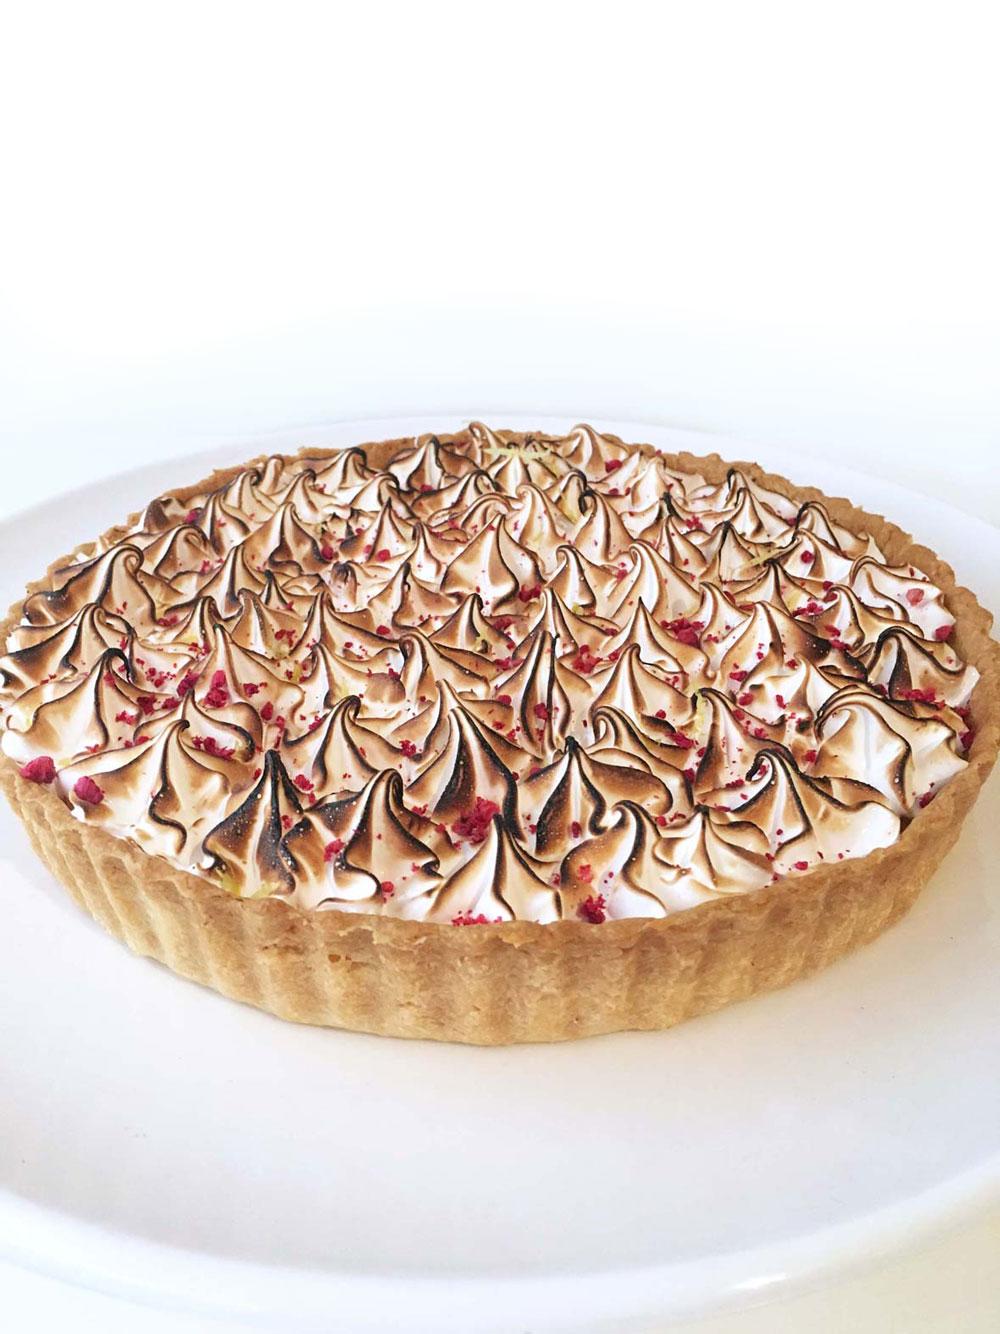 The_Little_Cake_Maker_Perth_Baker_CustomCakes_DayCakes_Slices_Tarts_Cupcakes_Tarts_1.jpg